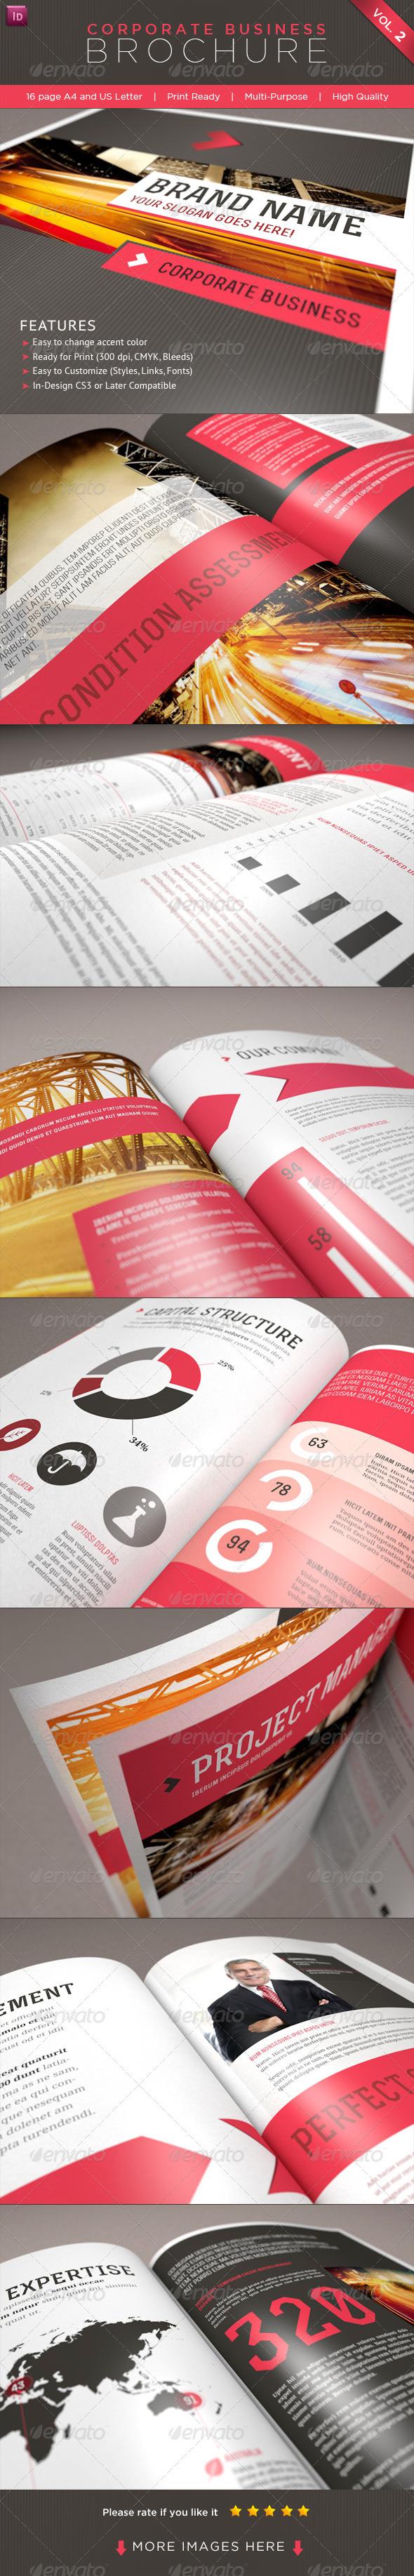 GraphicRiver Professional Corporate Business Brochure Vol 2 1832317